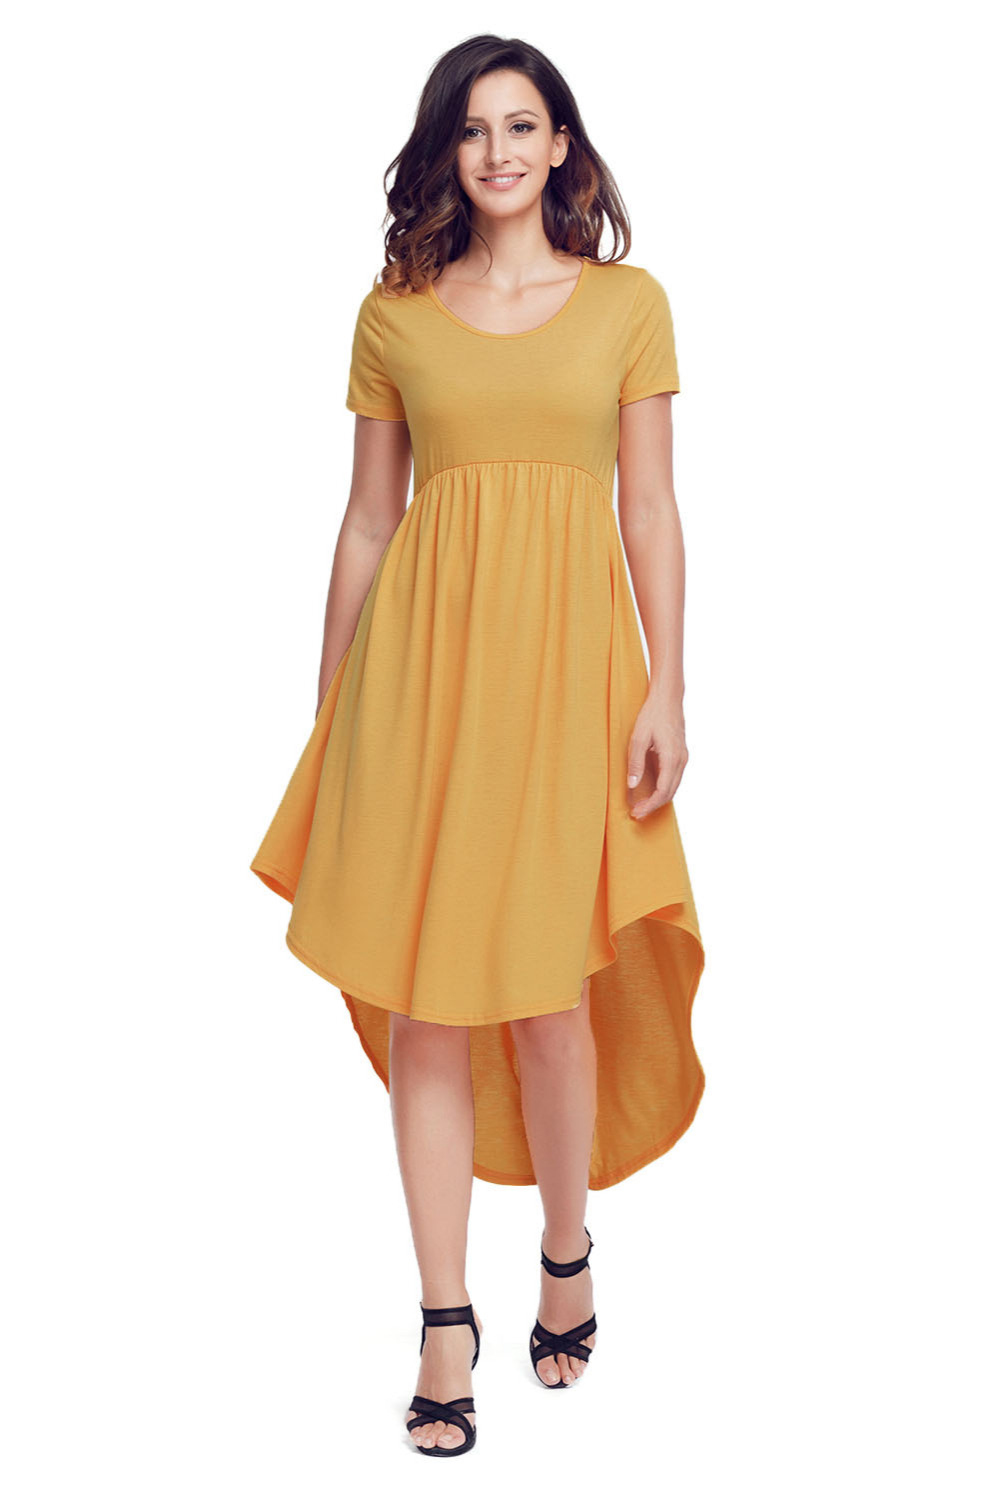 New Summer Style Women Beach Club lady bohemian Elegant Jersey Yellow Short Sleeve High Low Pleated Casual Swing Dress 220045-7